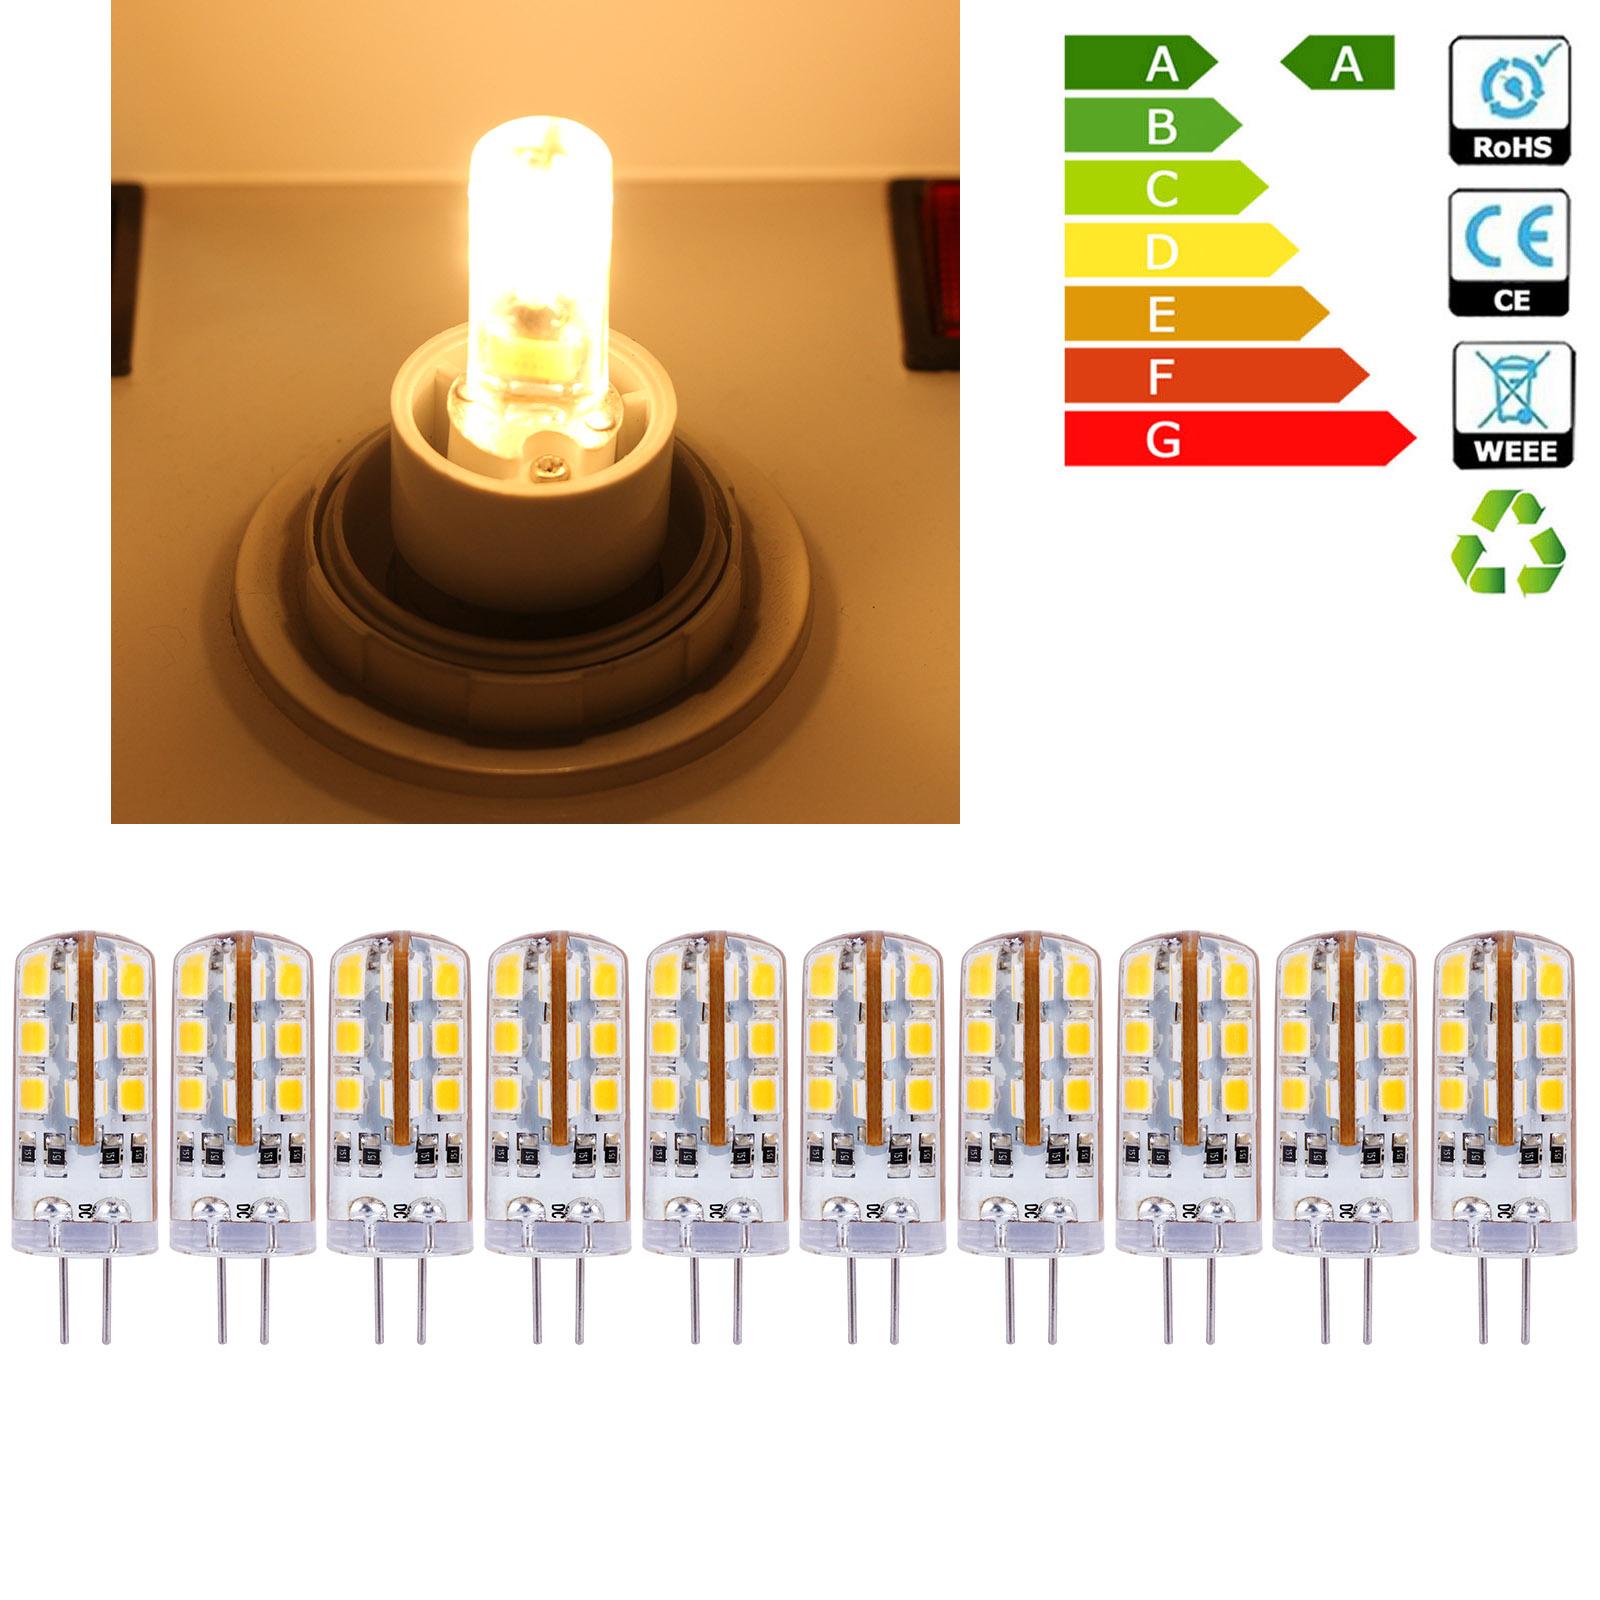 10 x ampoules 2w led lumiere jaune chaud 24 led eclairage decoration lampe ebay. Black Bedroom Furniture Sets. Home Design Ideas